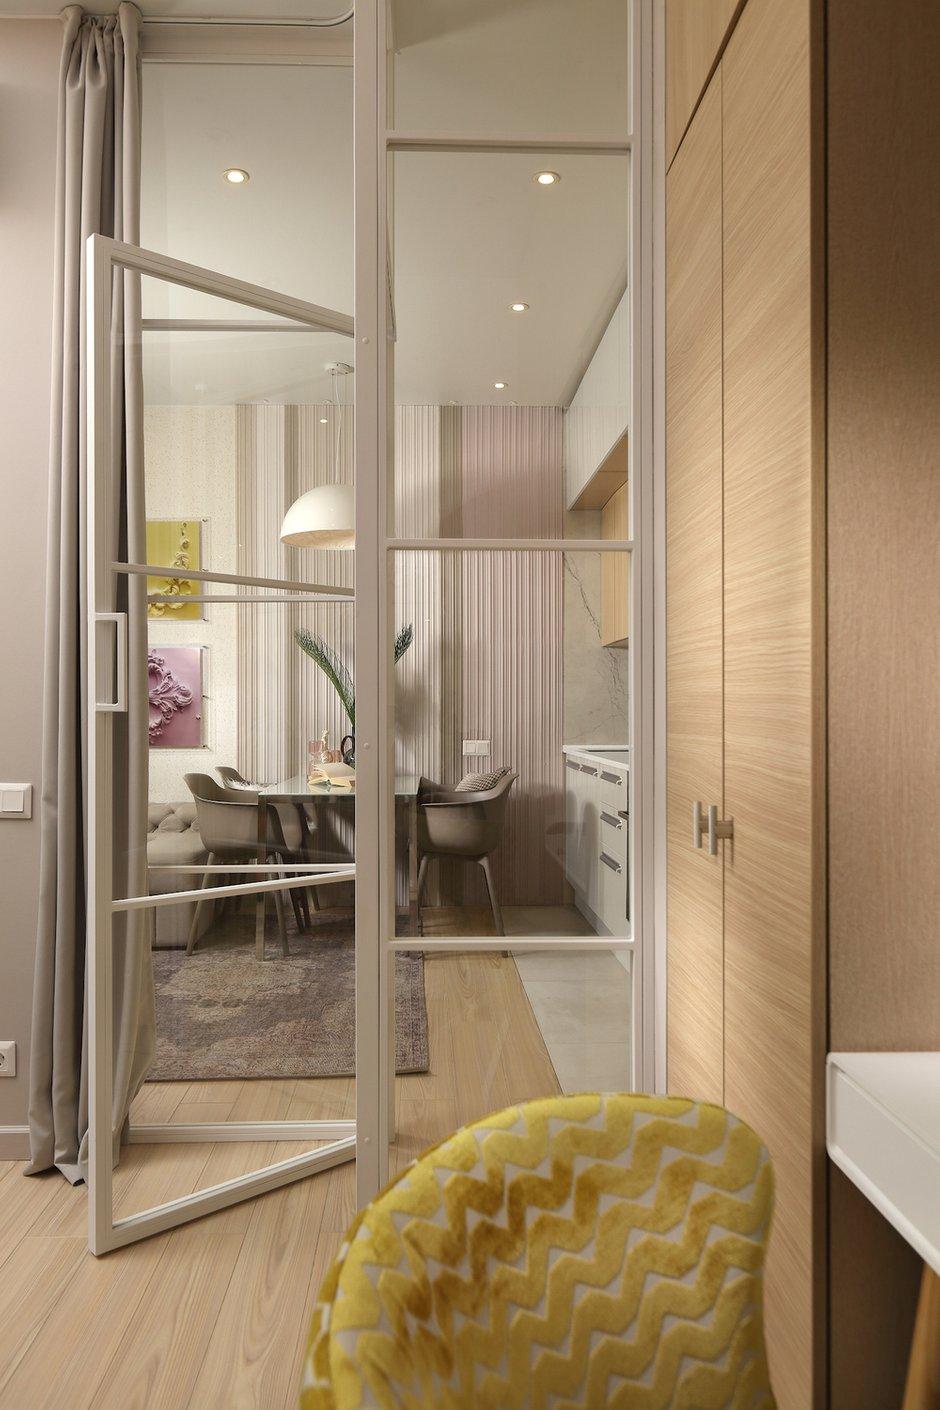 Фотография: Спальня в стиле Современный, Малогабаритная квартира, Квартира, Проект недели, Москва, 1 комната, до 40 метров, Своя атмосфера – фото на INMYROOM